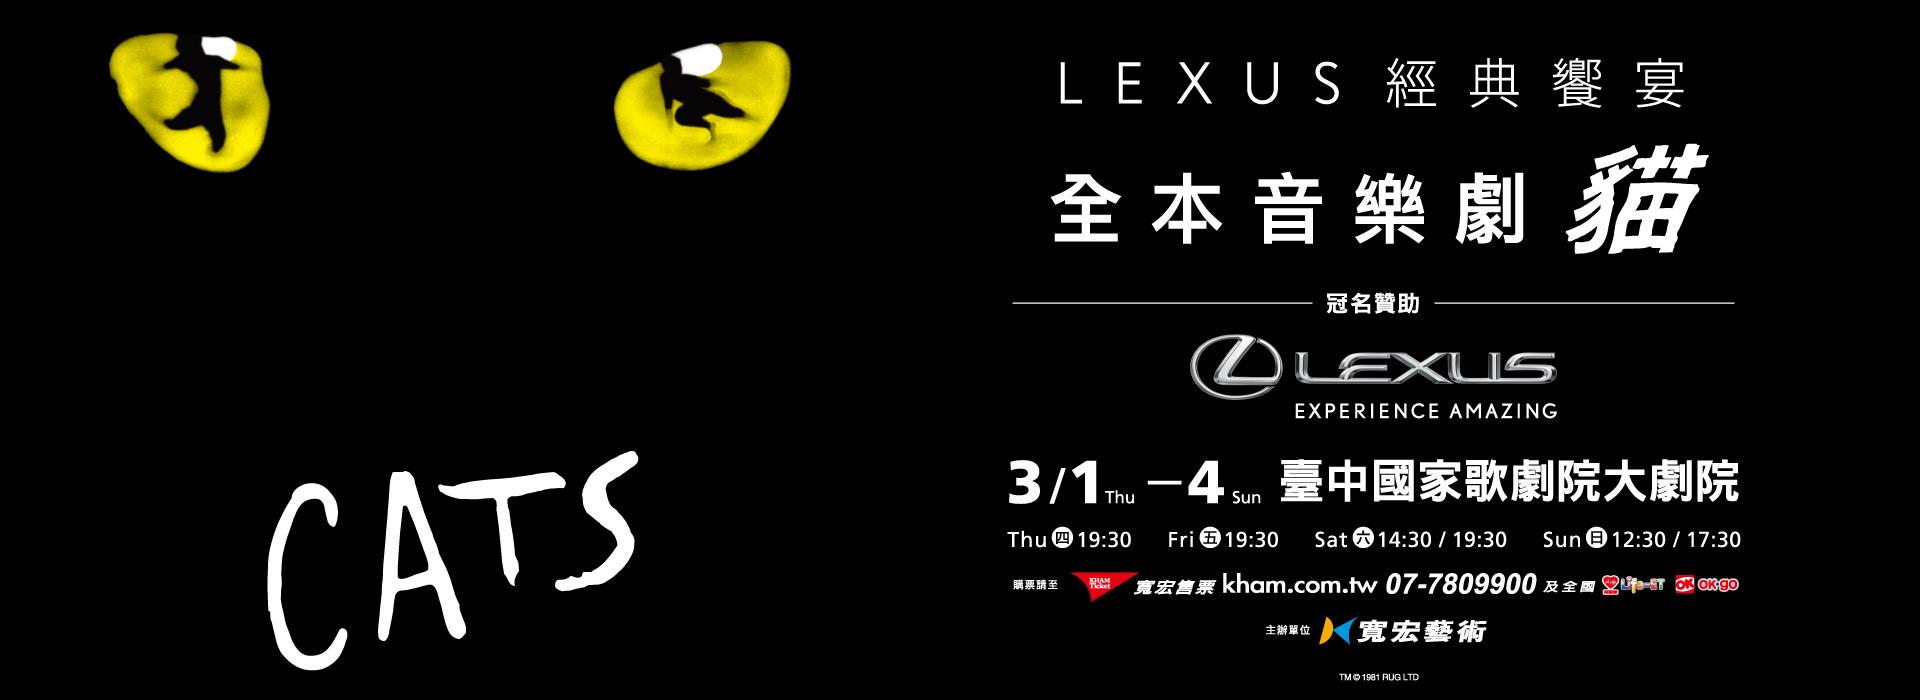 lexus经典飨宴 全本音乐剧《猫》